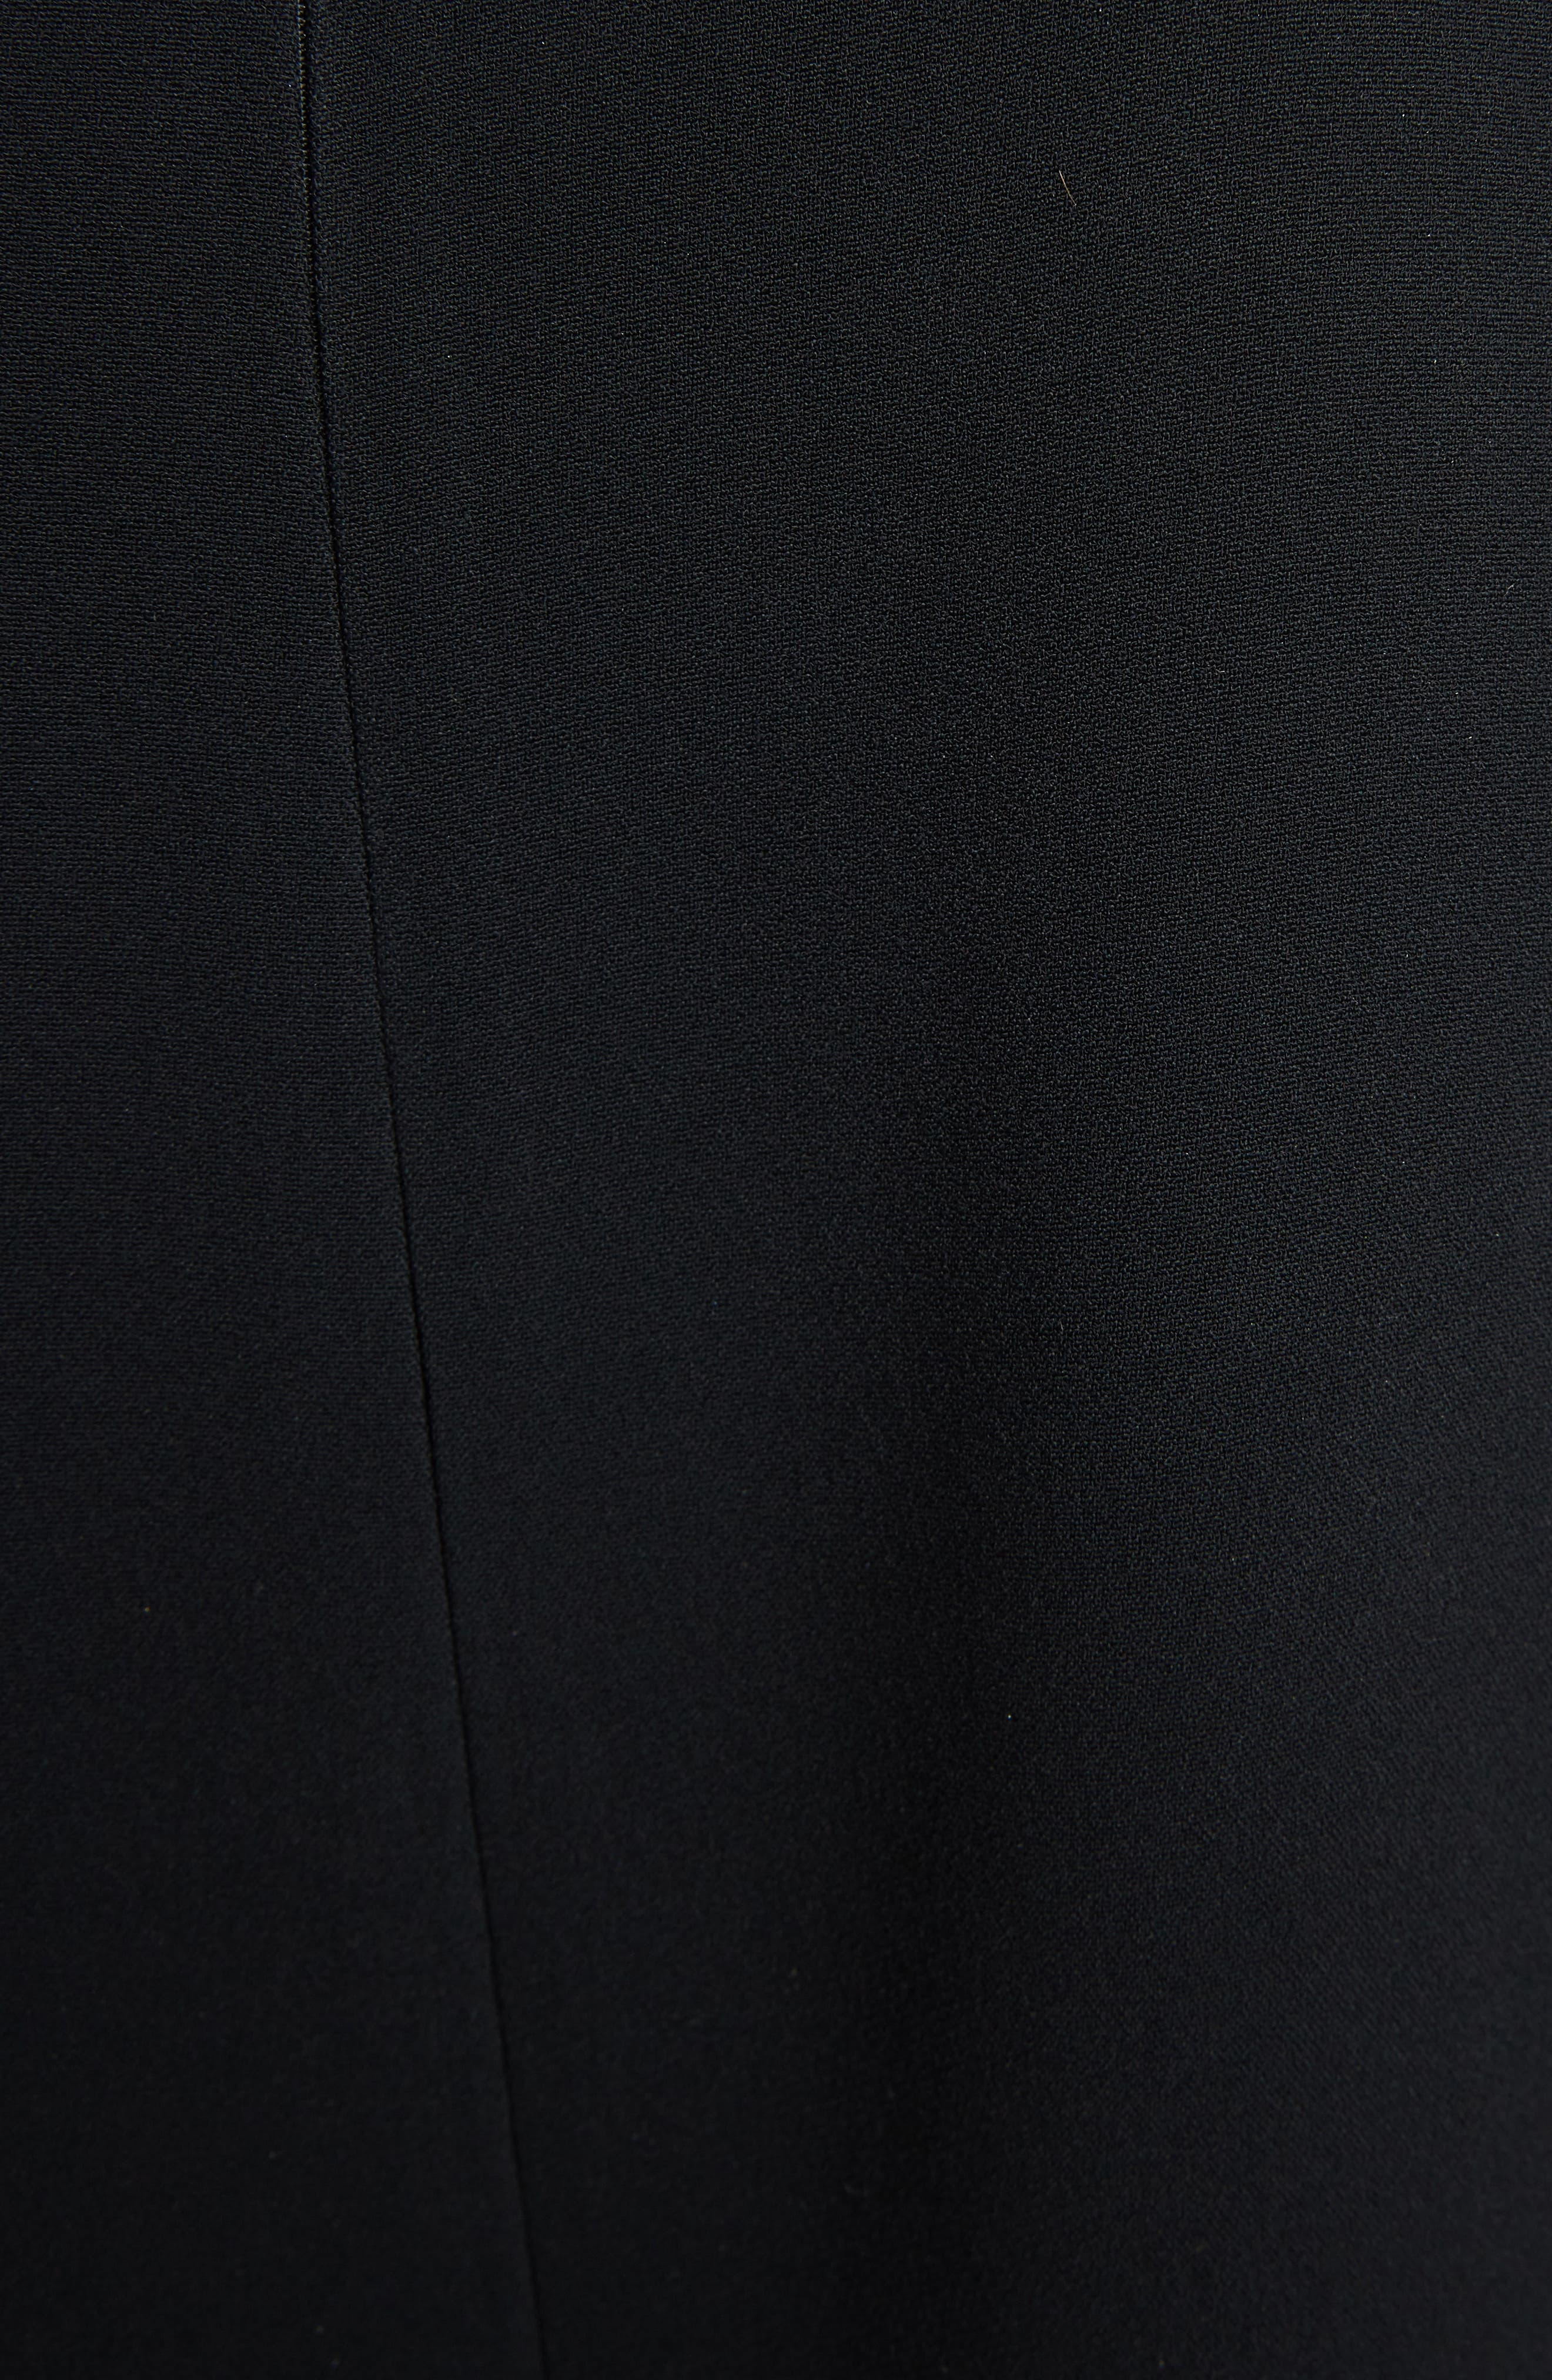 VICTORIA BECKHAM, Asymmetrical Pleat Shift Dress, Alternate thumbnail 5, color, BLACK